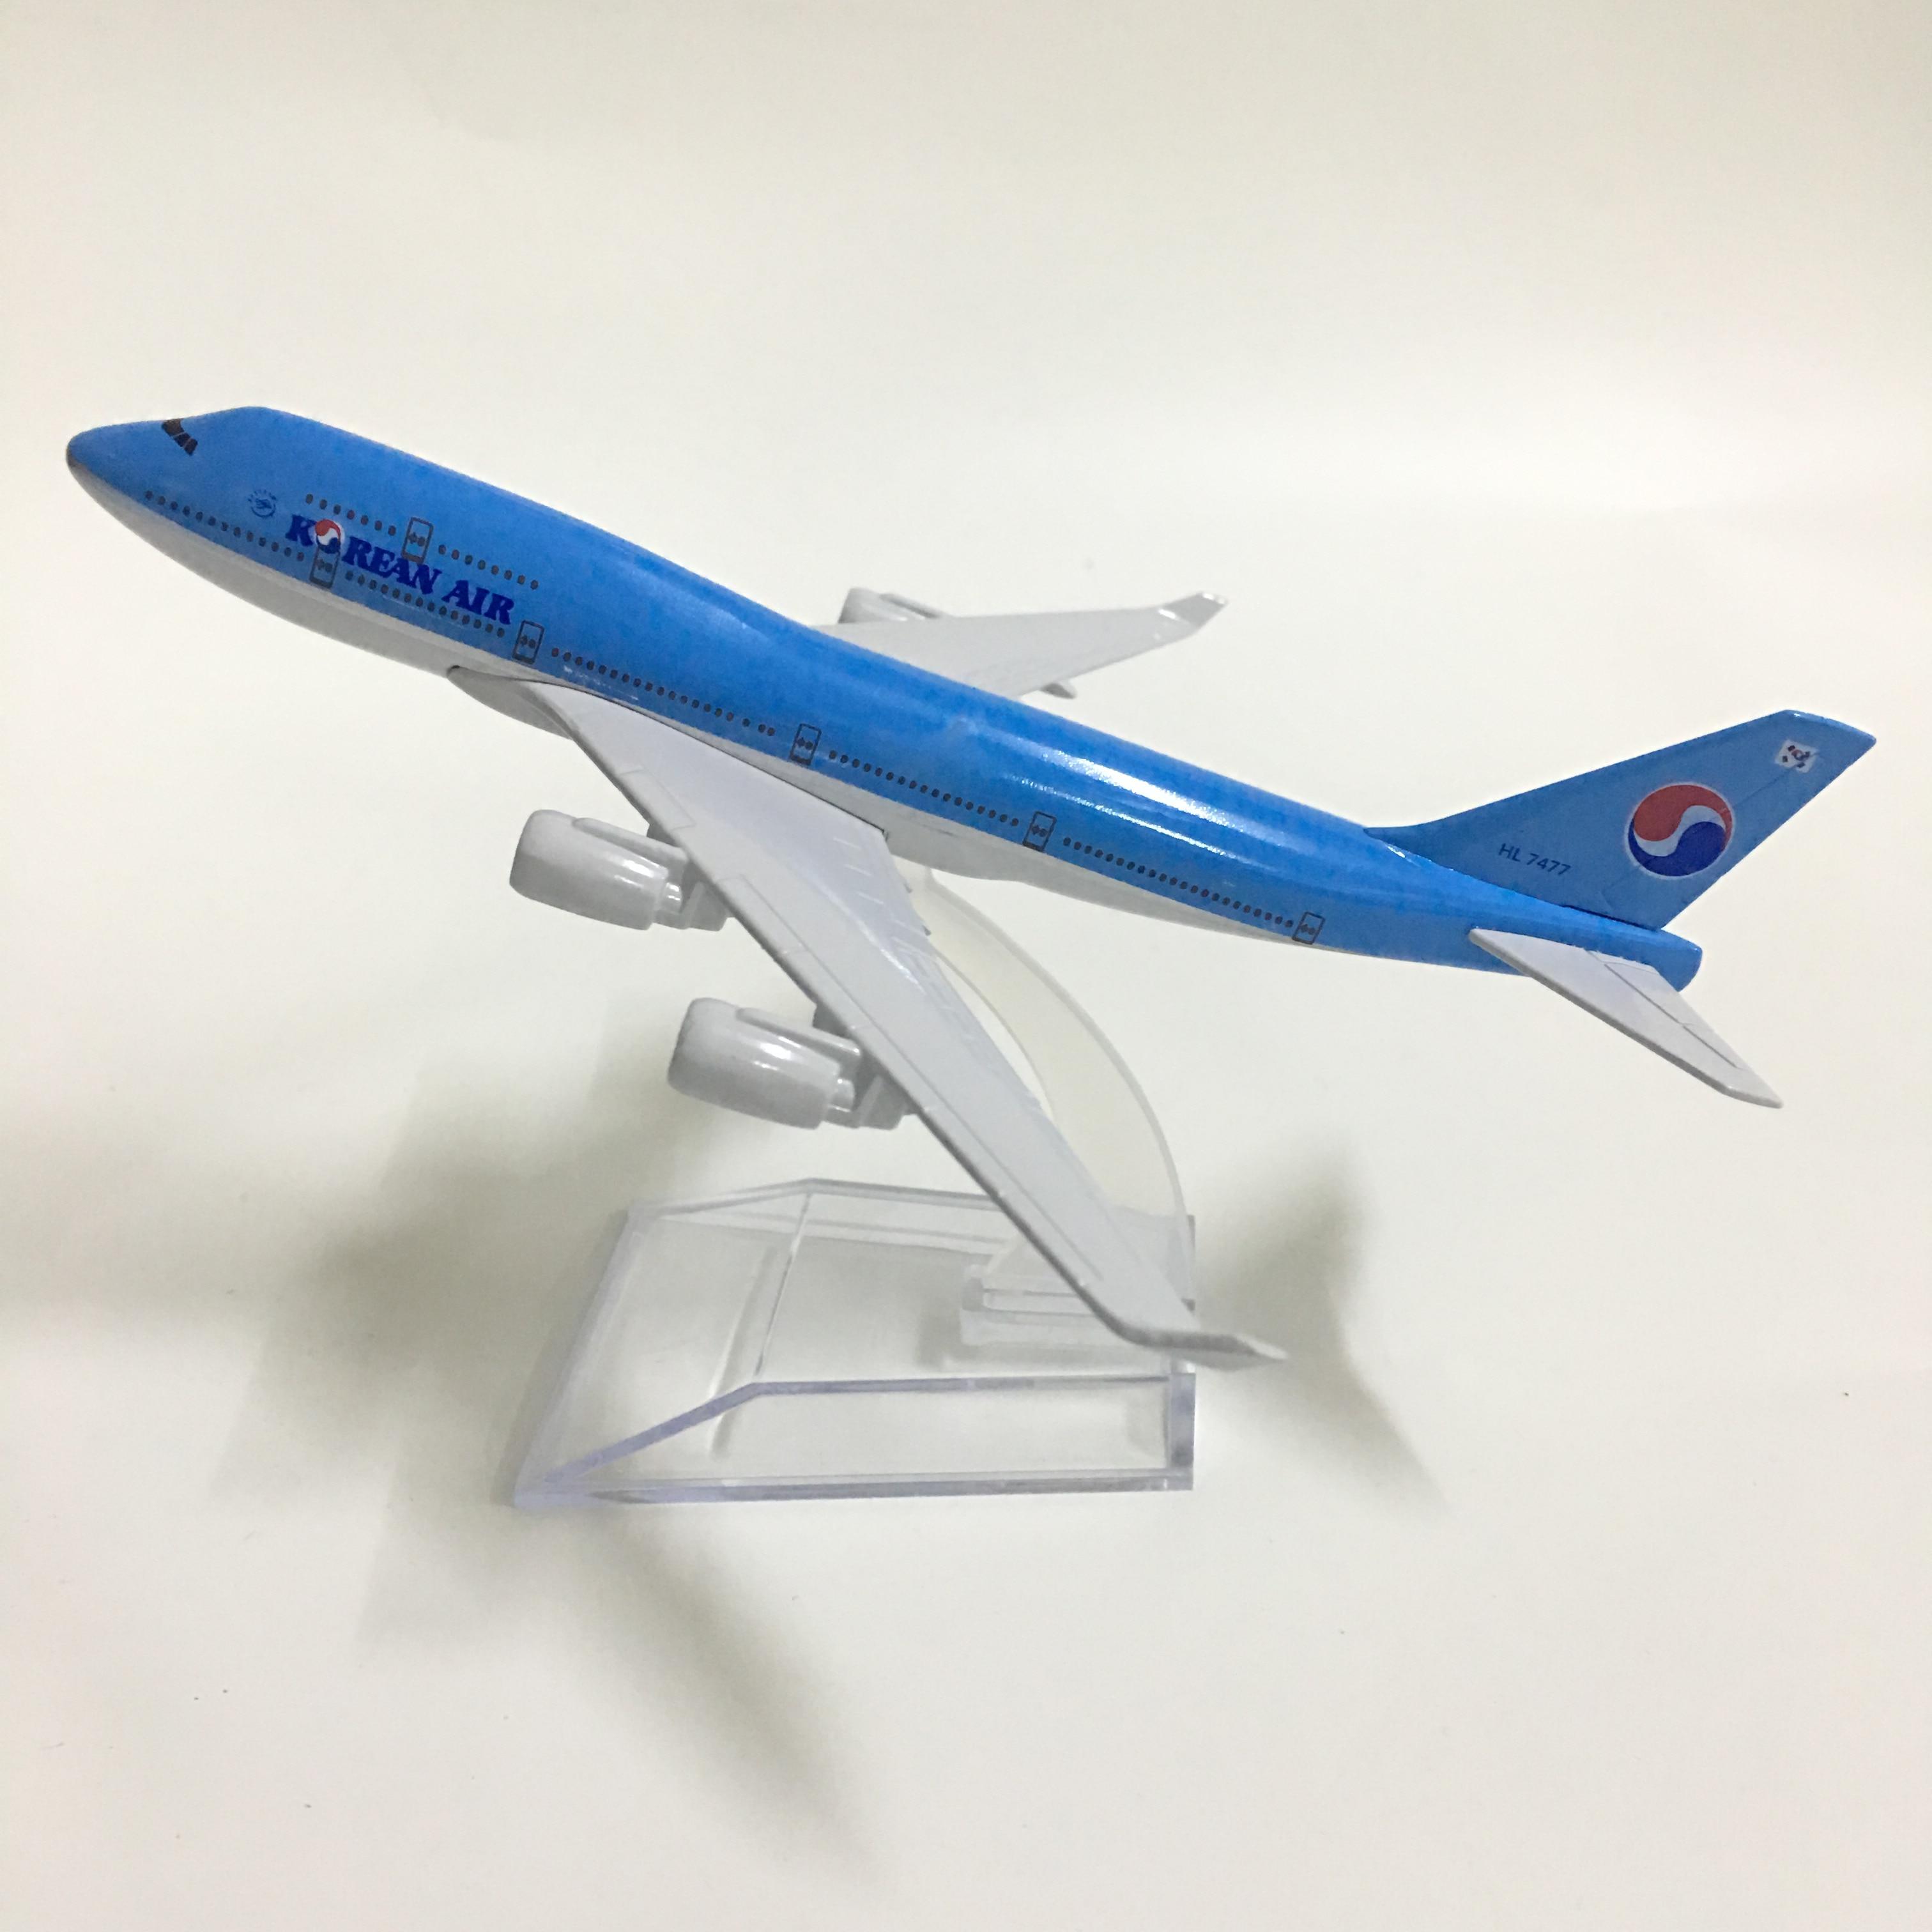 JASON TUTU 16cm Korean Air Boeing 747 Aircraft Model Diecast Metal 1:400 Plane Model Airplane Model Airplanes Plane Toy Gift